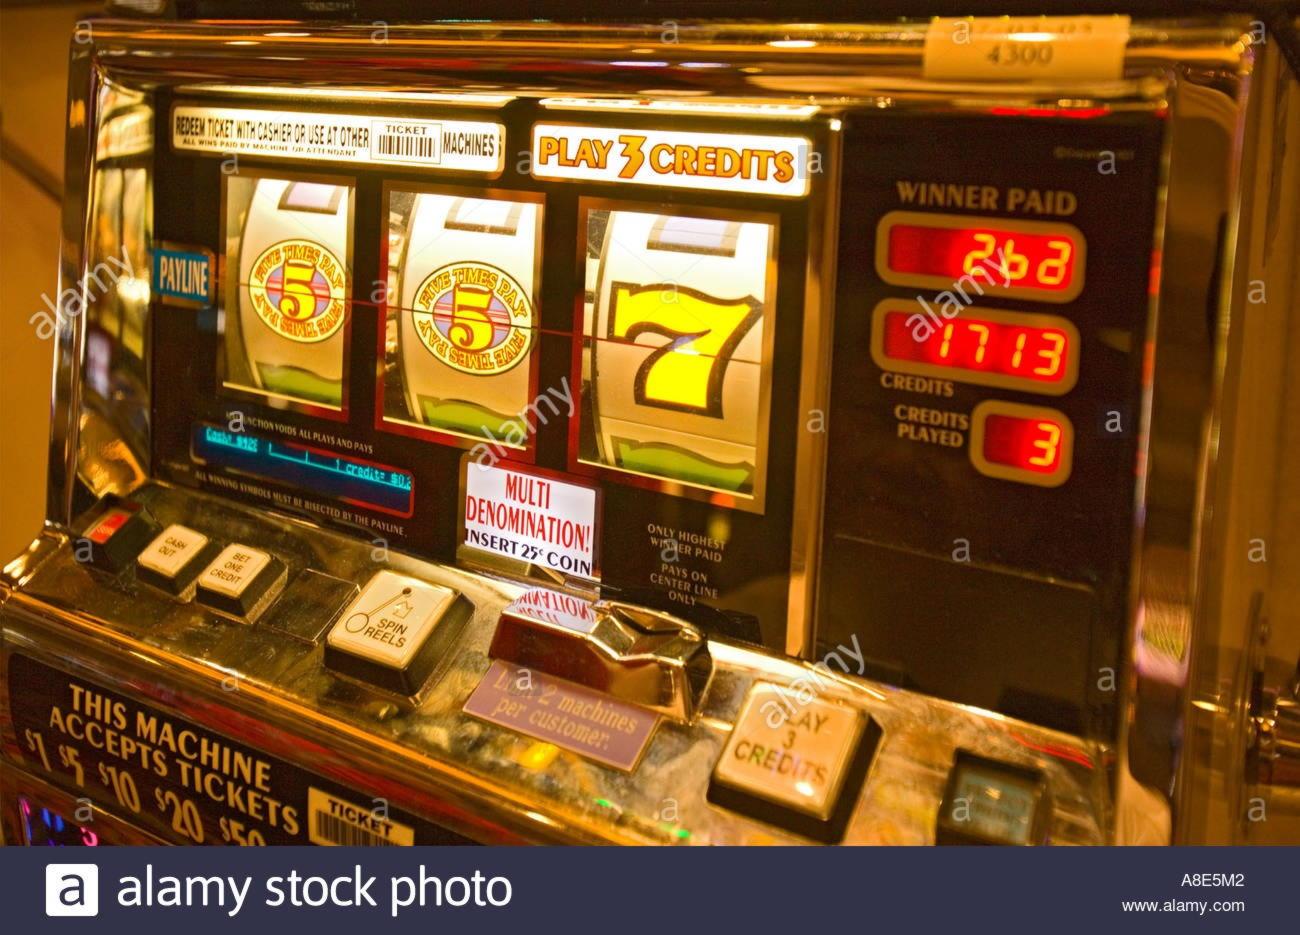 €150 Free Chip Casino at Ikibu